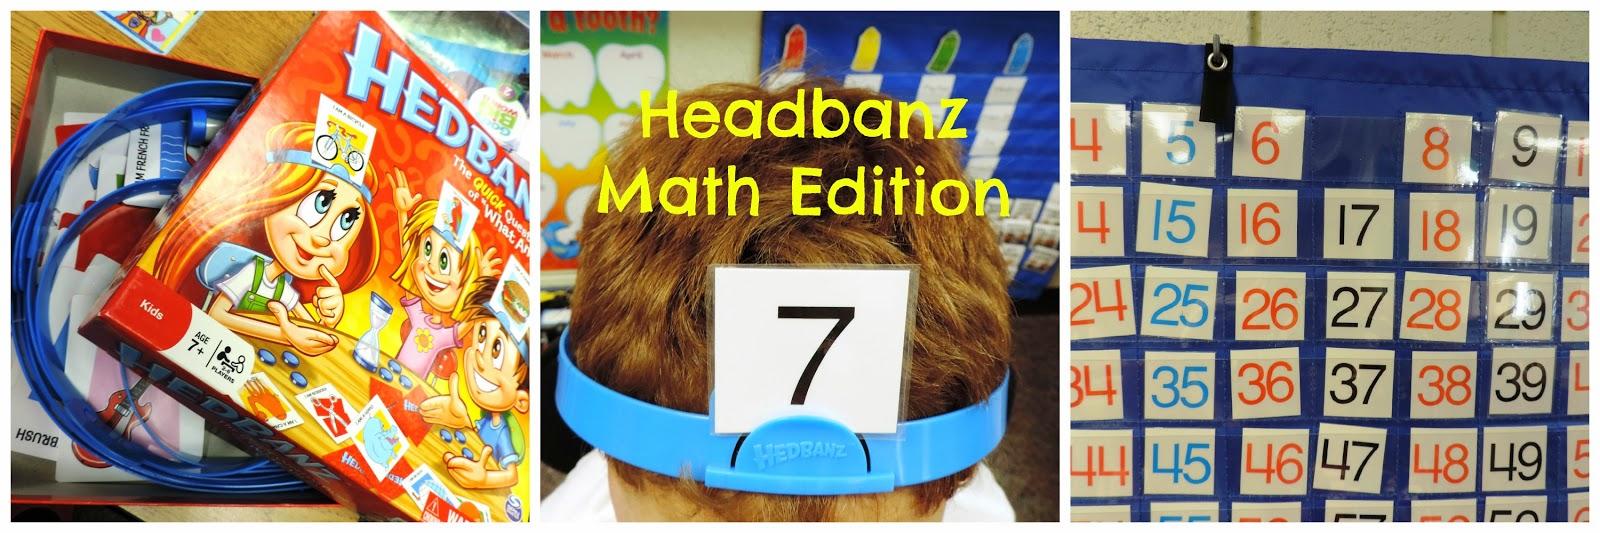 http://www.teachingmindsreachinghearts.blogspot.com/2015/03/five-for-friday.html